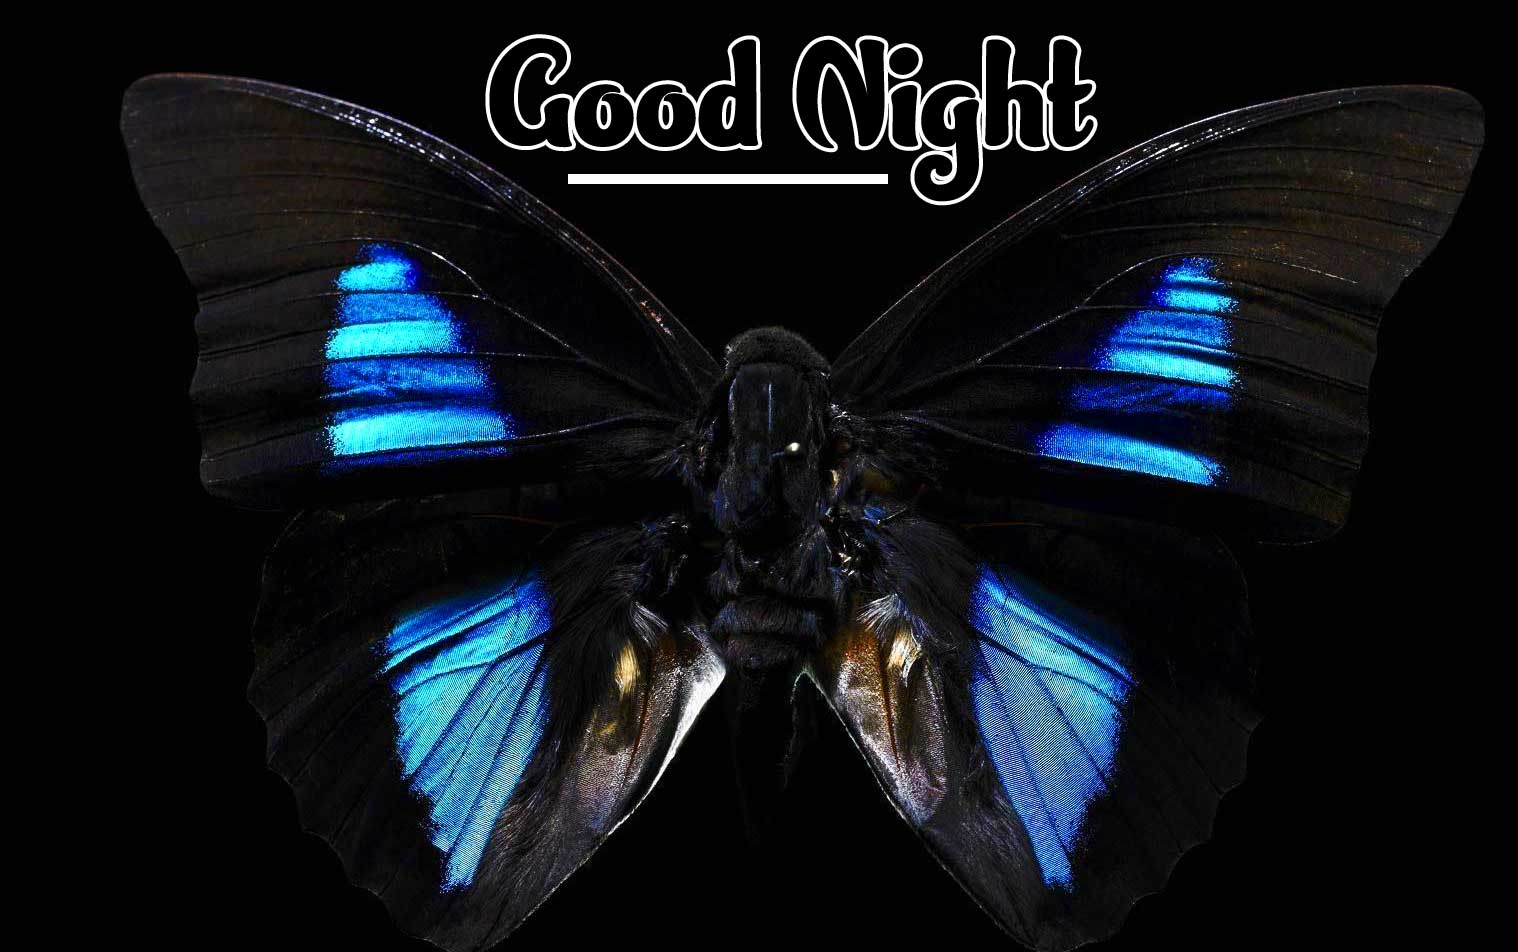 Cute Babies Good Night ImagesPics hd for Whatsapp